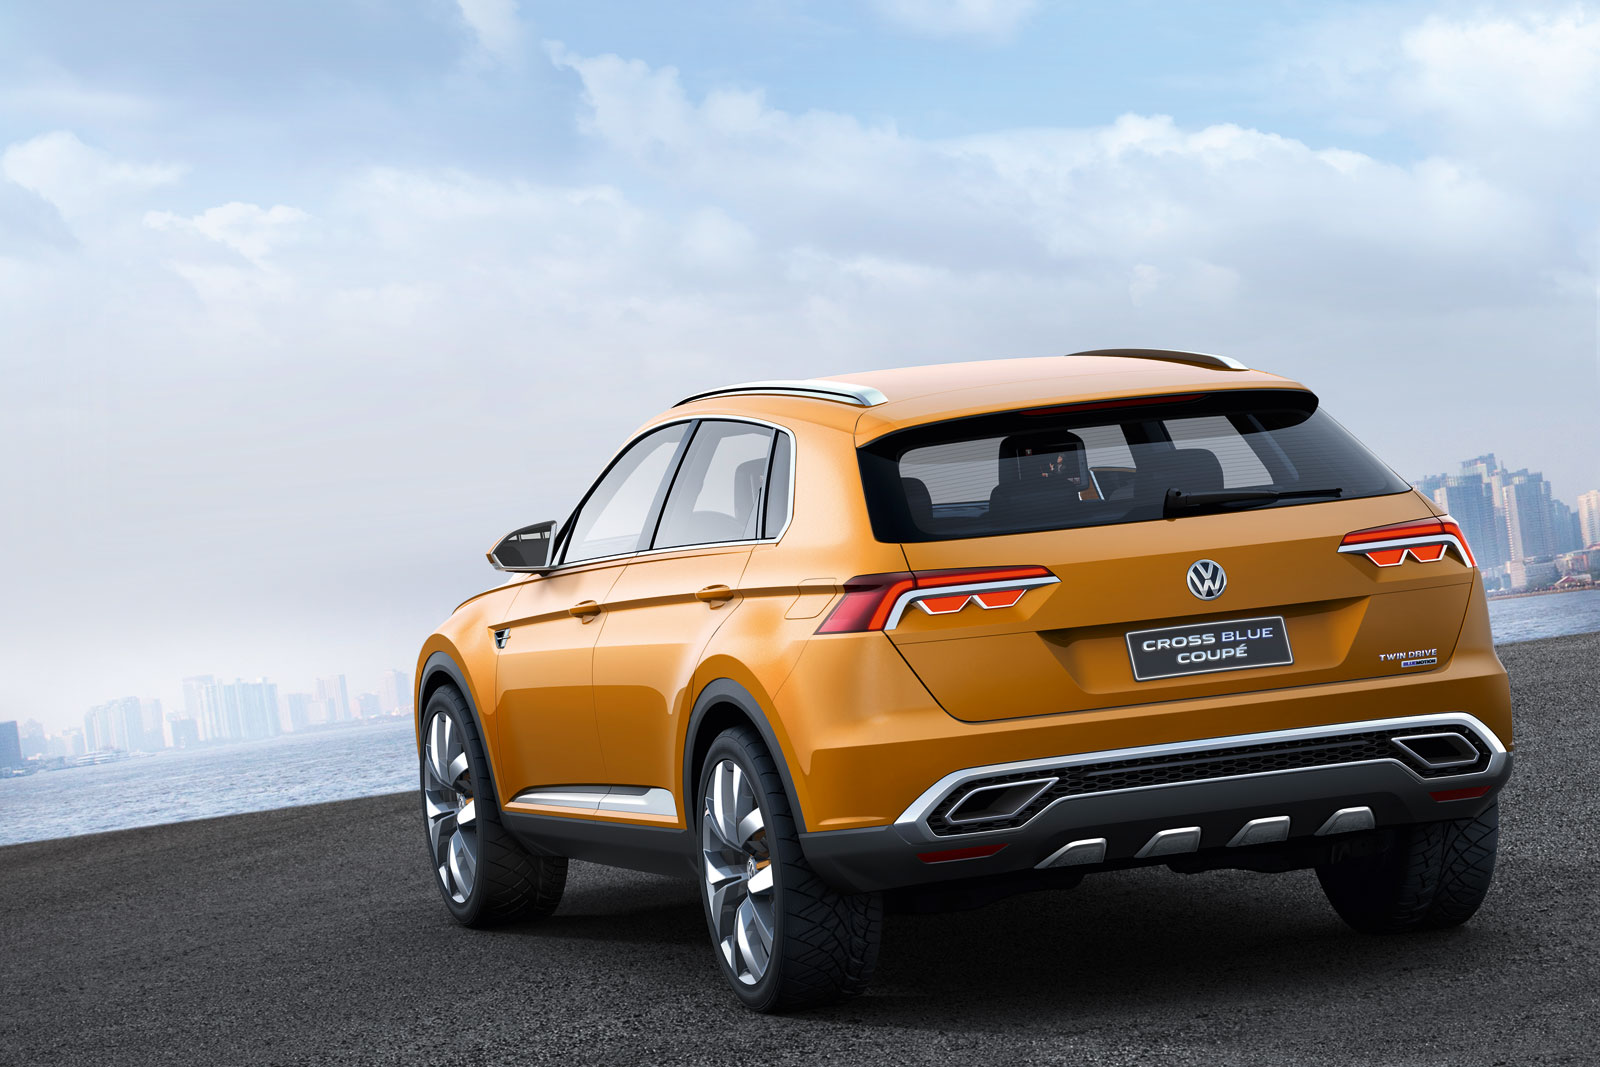 Volkswagen CrossBlue Coupe Concept Car Body Design